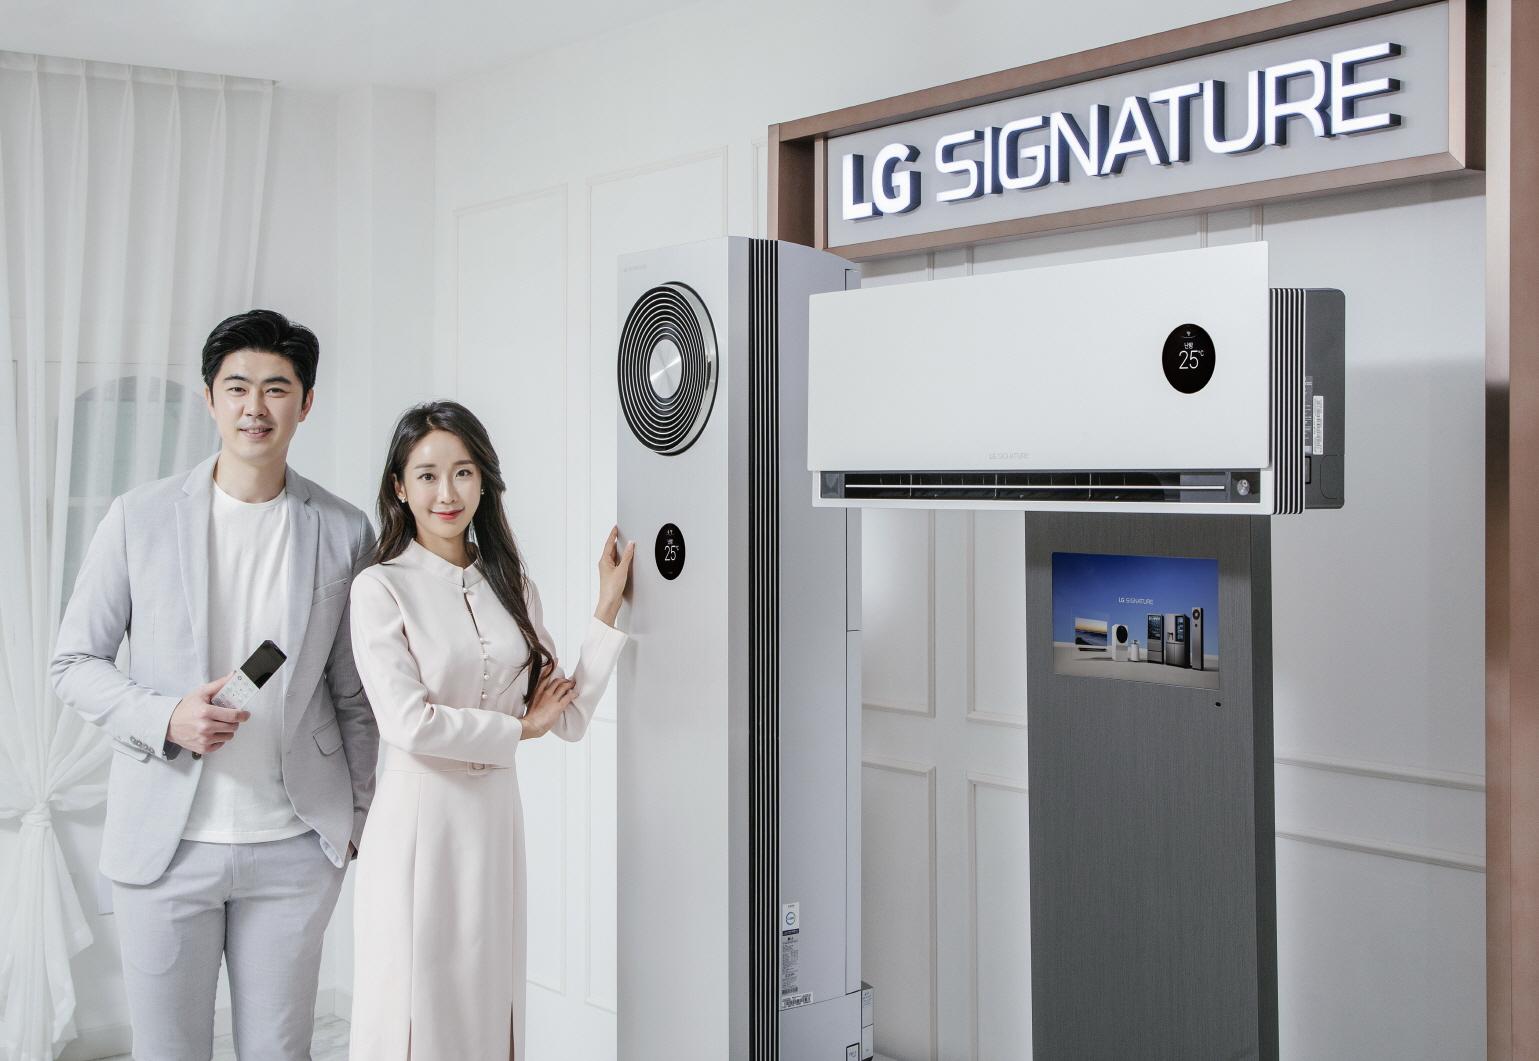 LG전자 모델이 냉방 성능을 강화한 超프리미엄 에어컨인 'LG 시그니처(LG SIGNATURE) 에어컨' 신제품을 소개하고 있다.